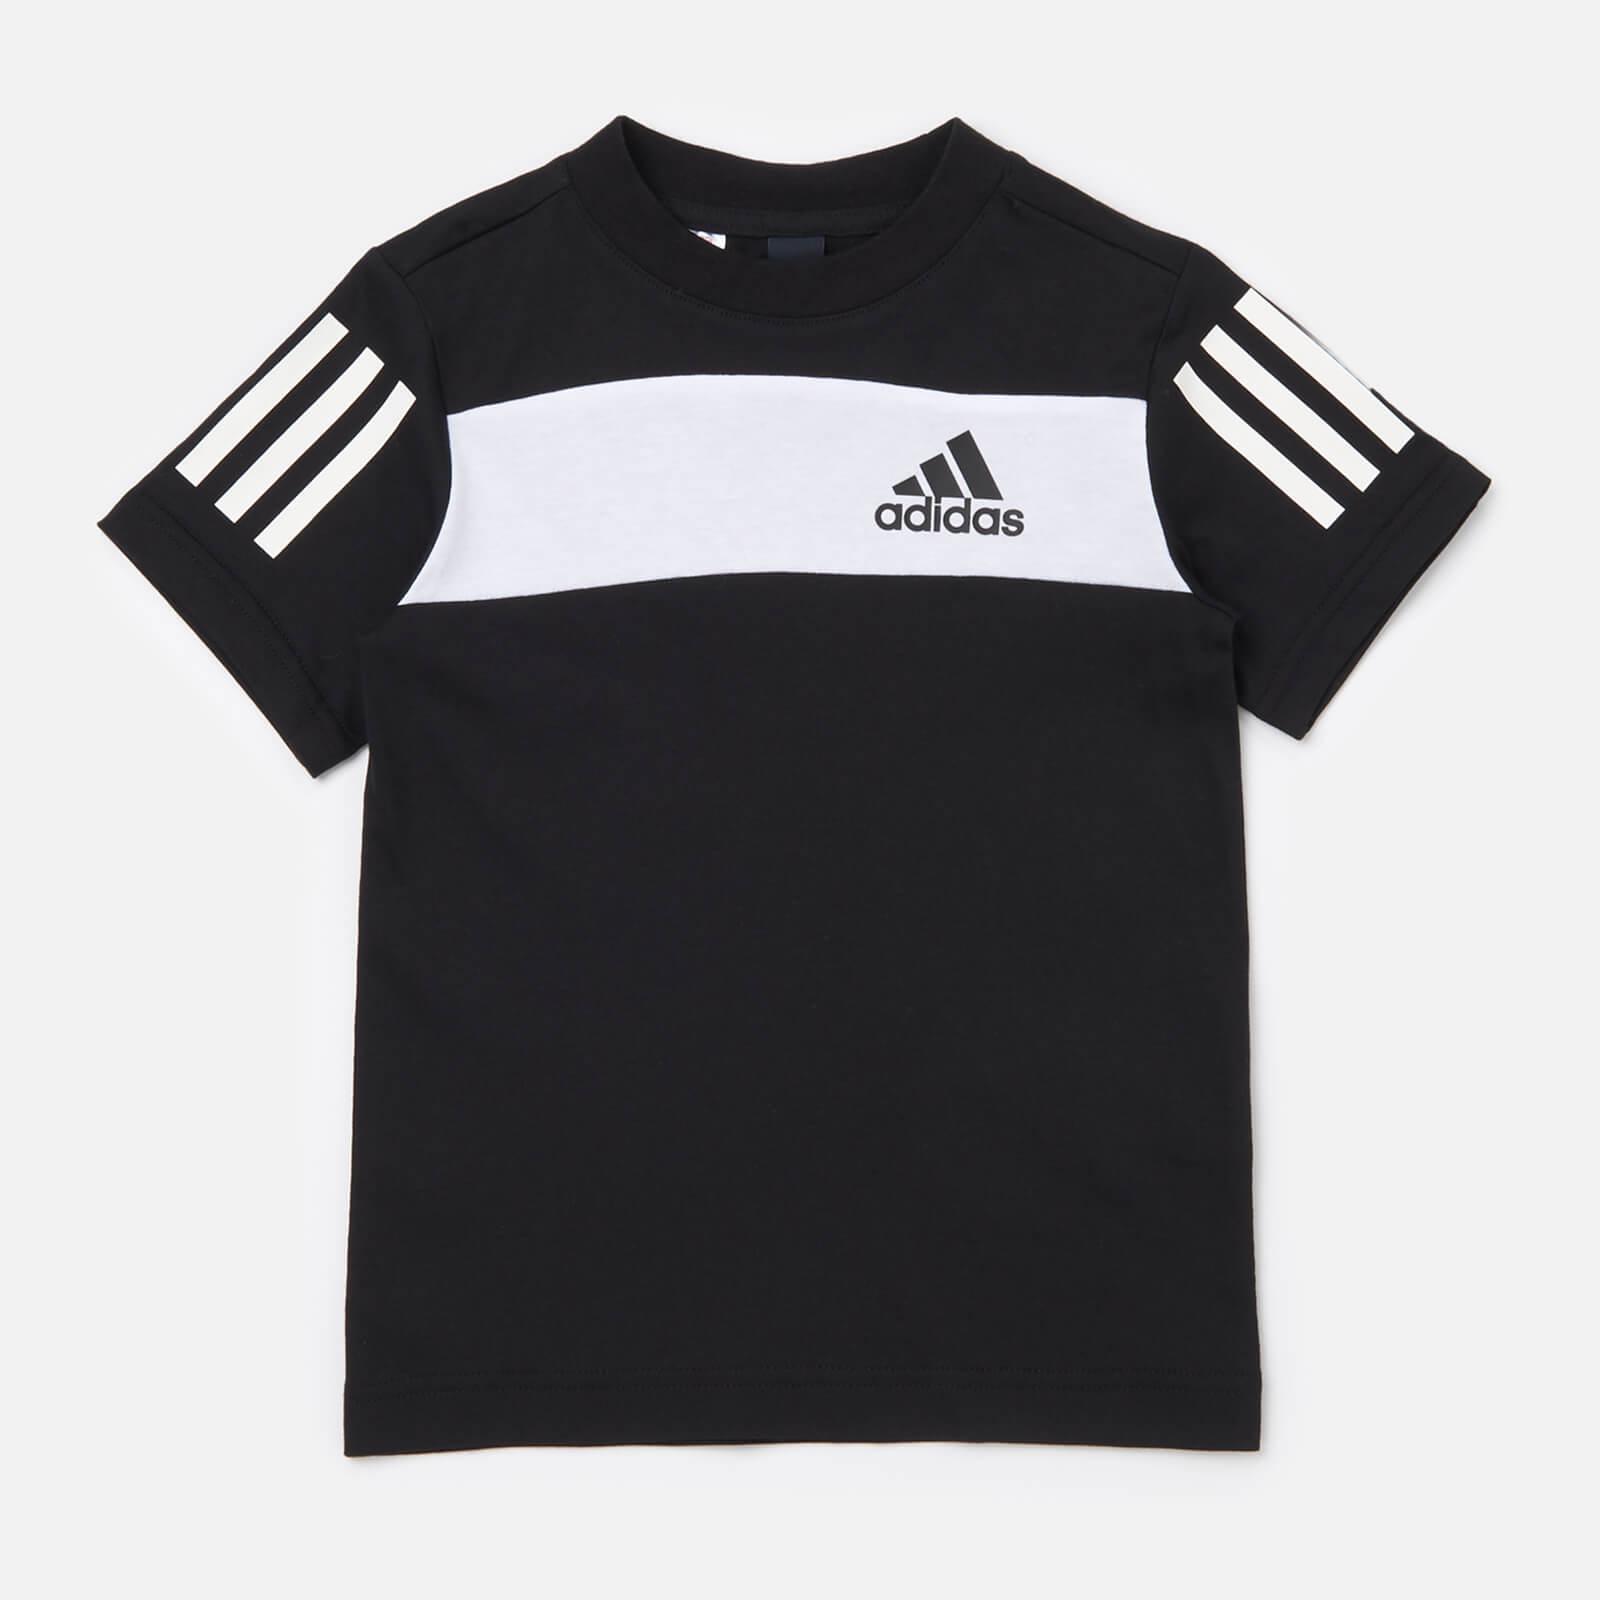 adidas Boys' Young Boys Sid T-Shirt - Black - 11-12 Years